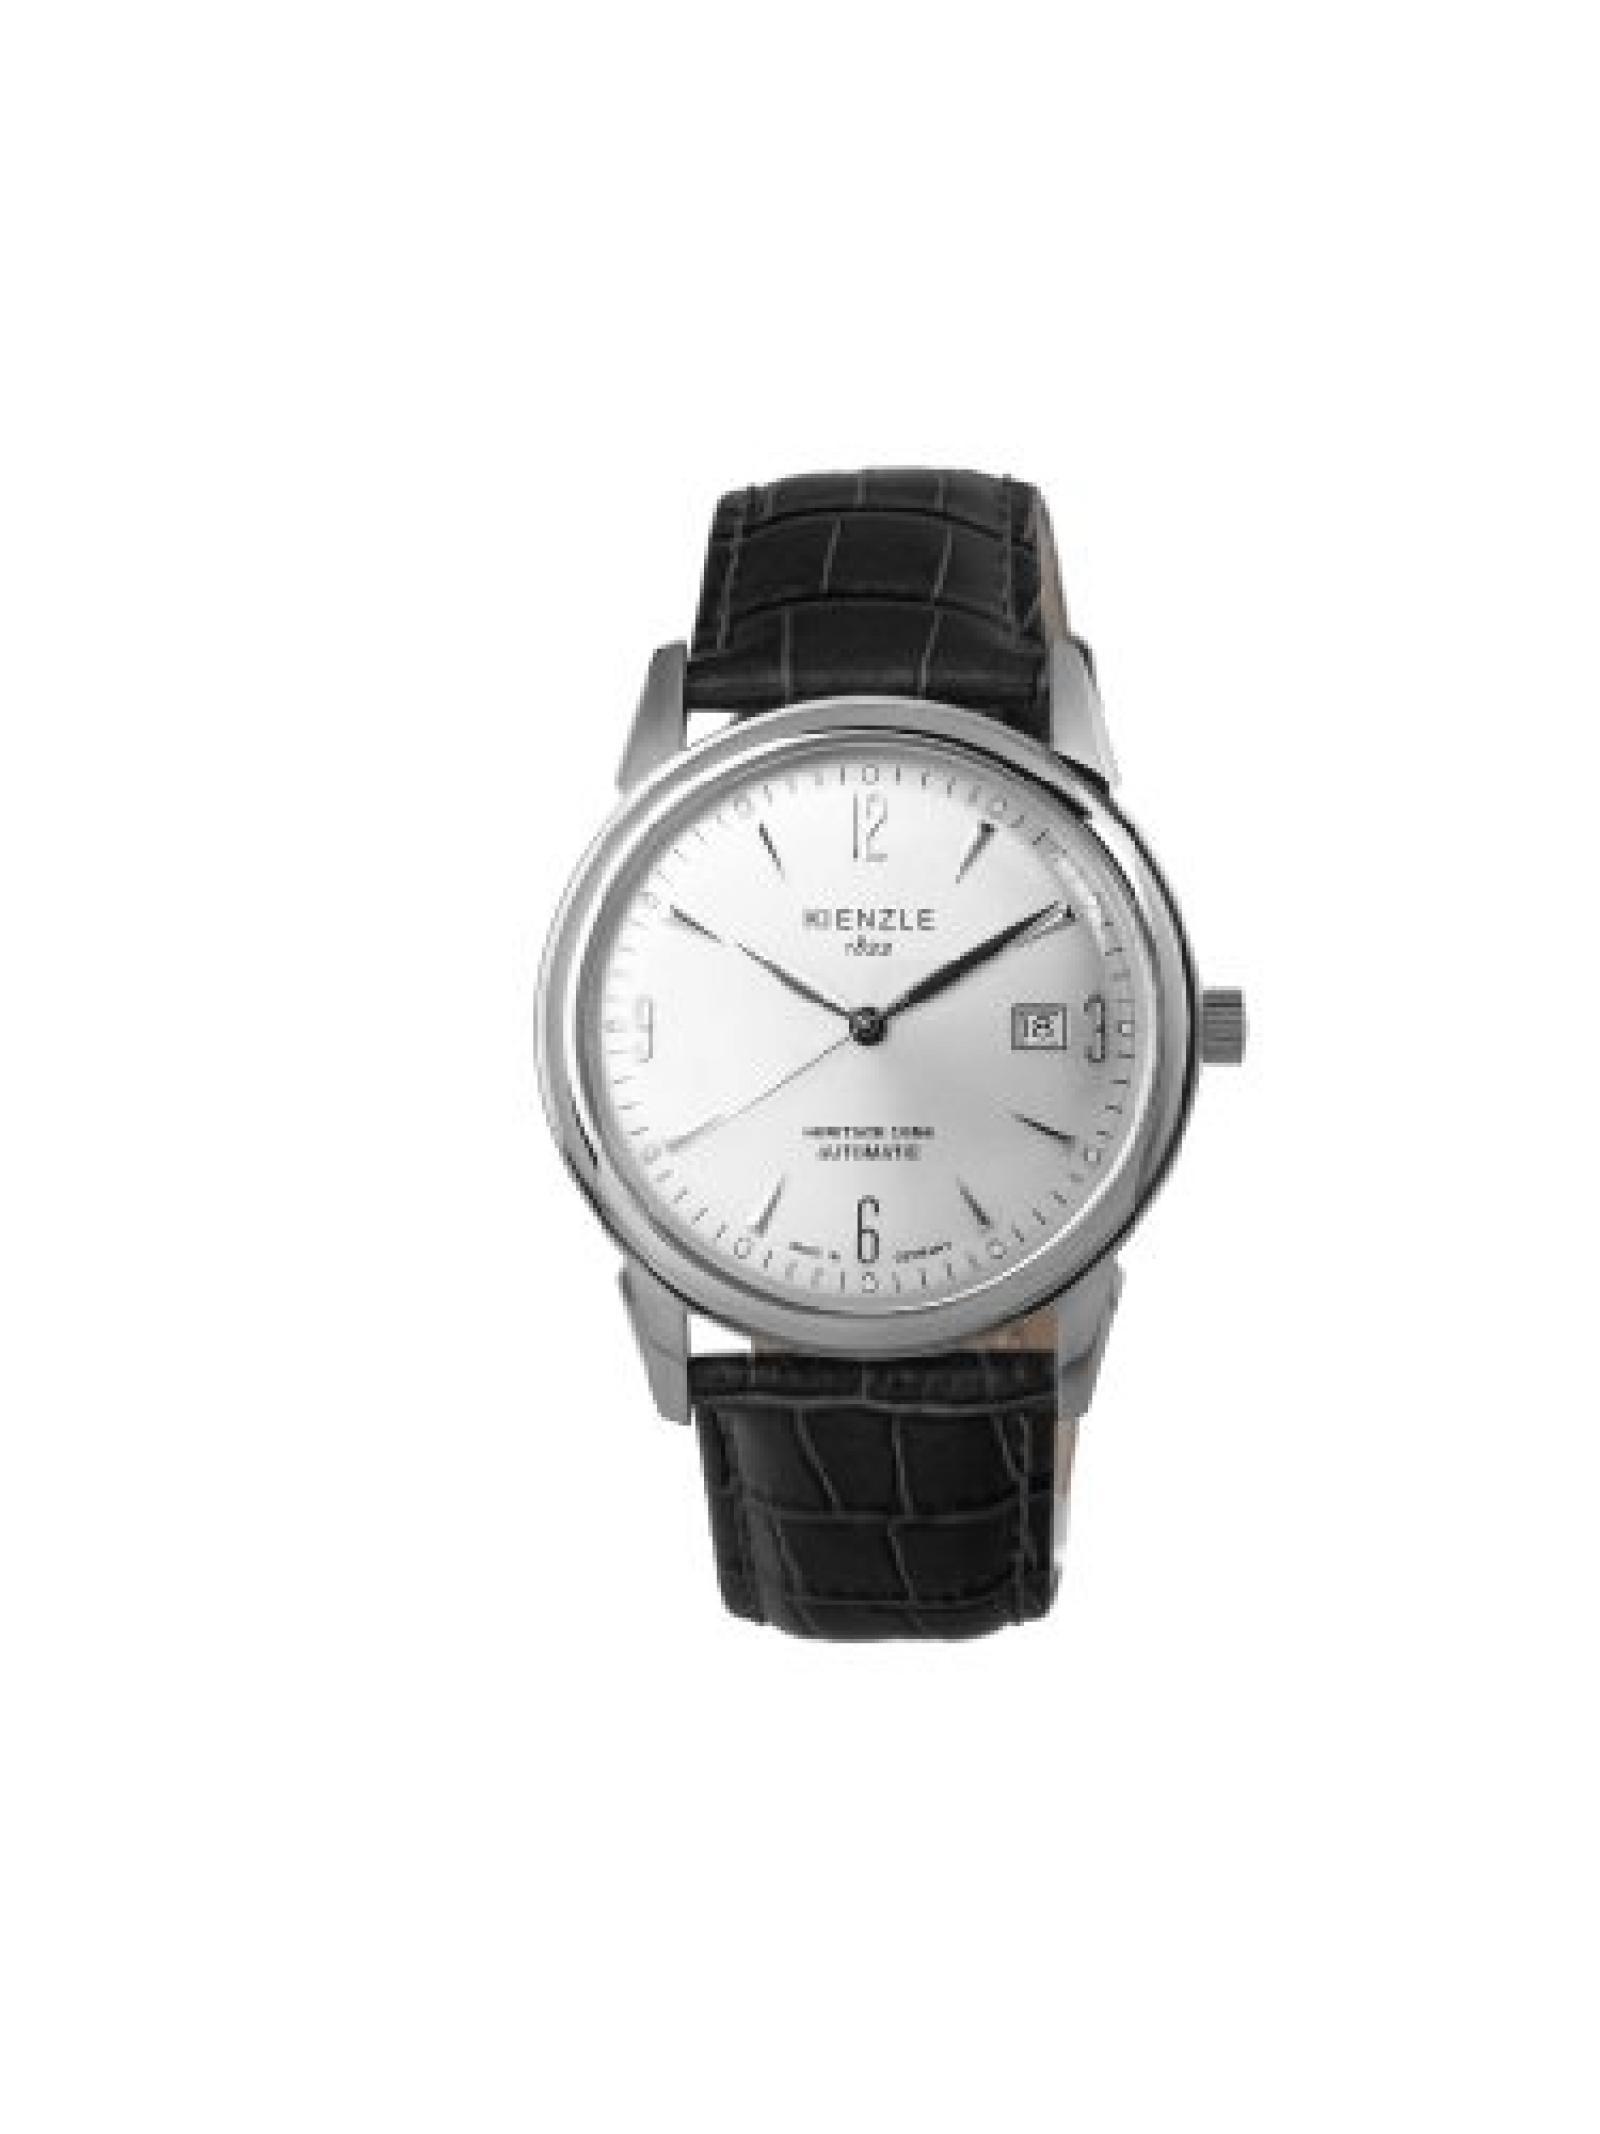 Kienzle Damen-Armbanduhr XS KIENZLE 1822 Automatik - Heritage 1956 Analog Automatik Lederarmband  Made in Germany K9112011031-00341